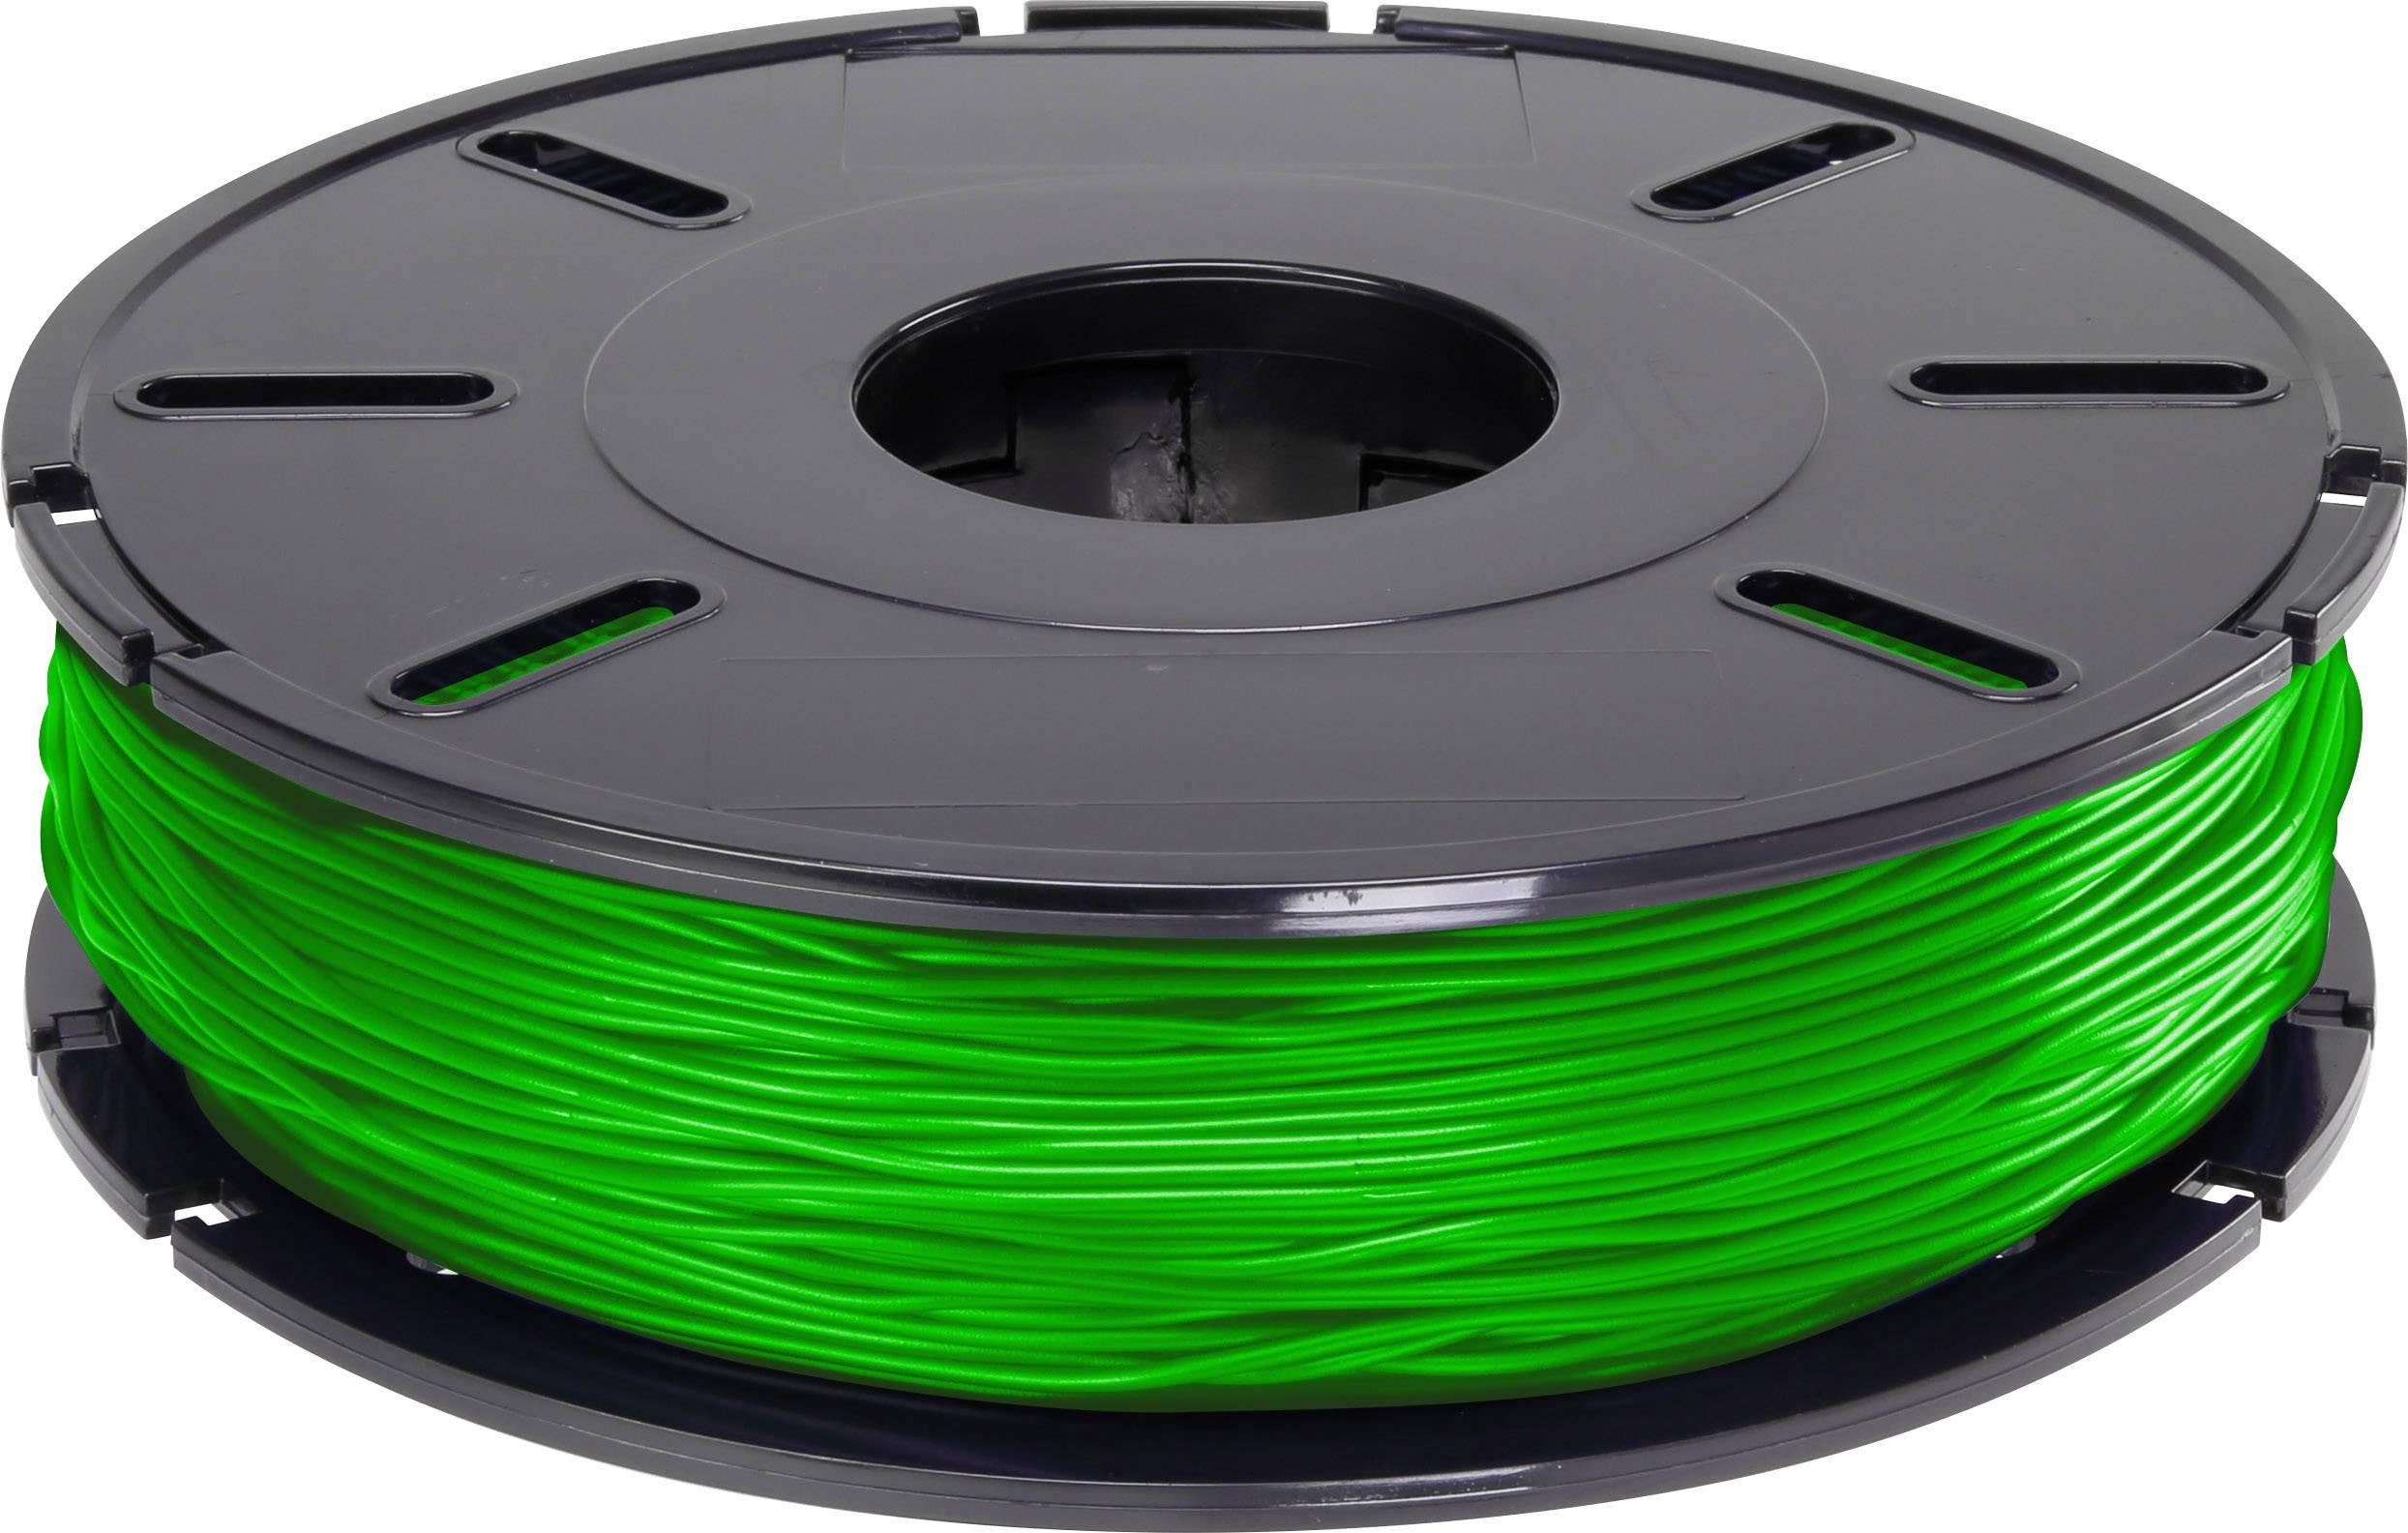 Vlákno pre 3Dtlačiarne, Renkforce 01.04.13.5209, 2.85 mm, 500 g, zelená